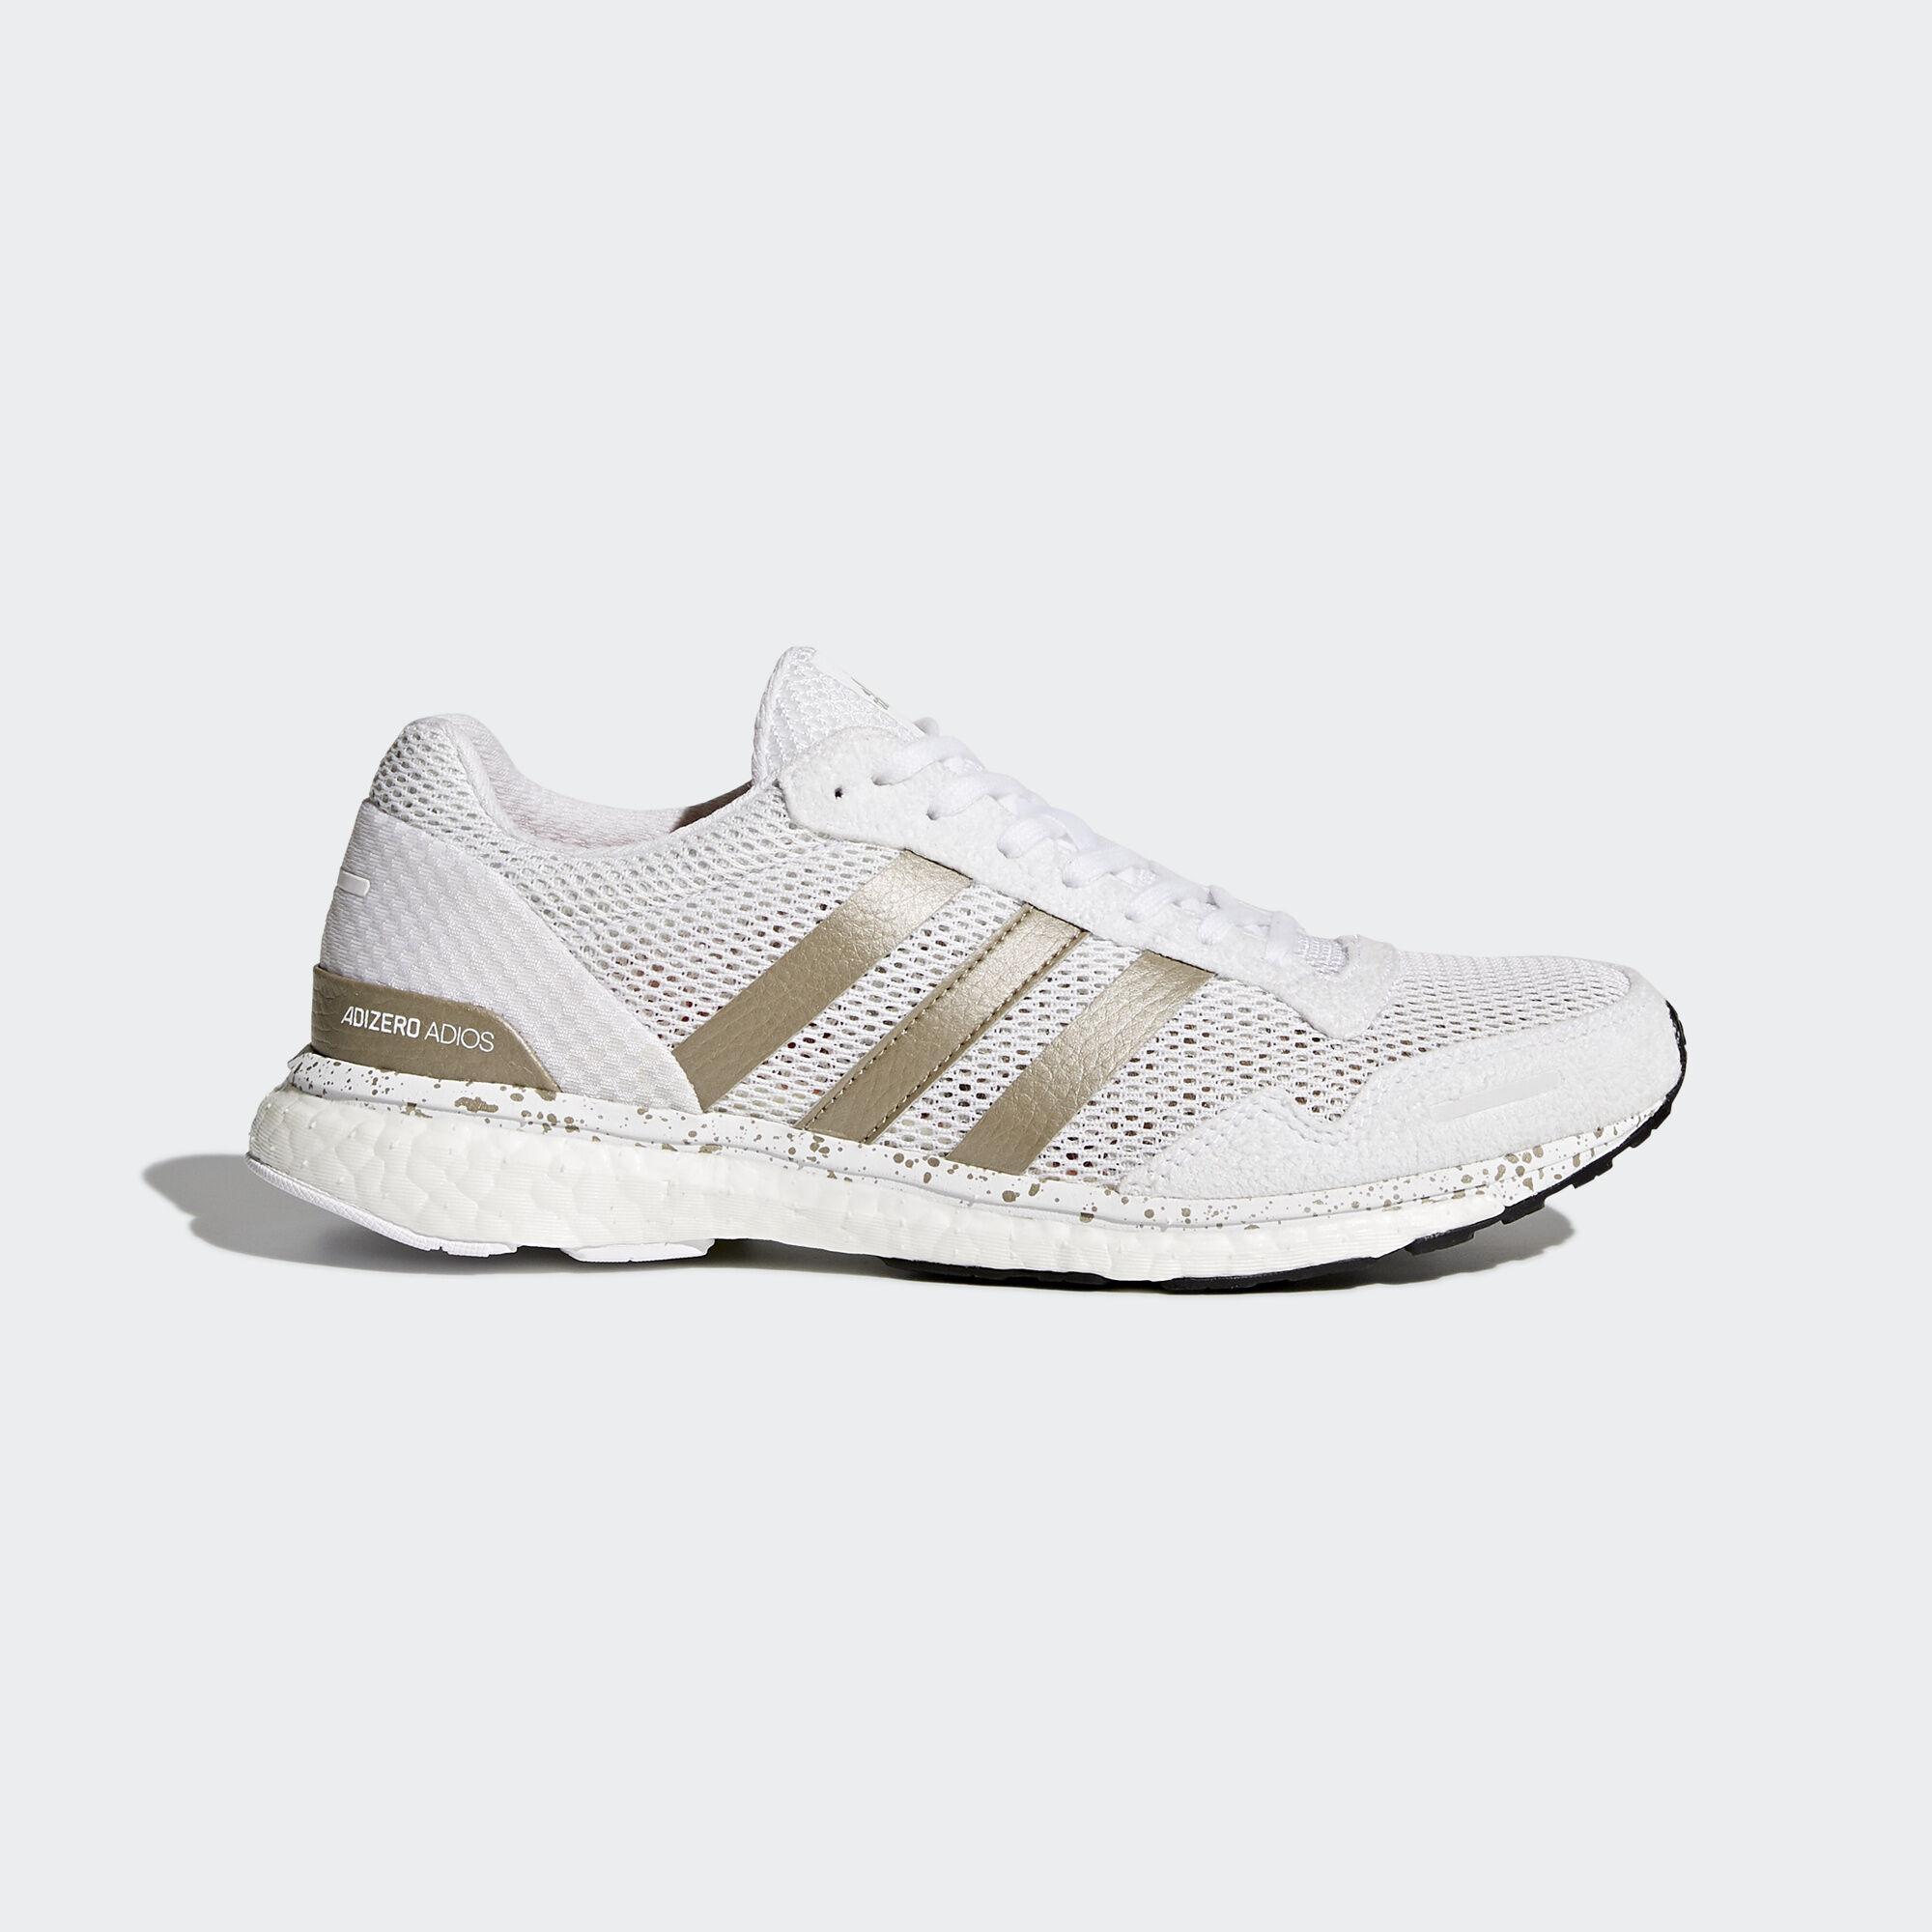 adidas - adizero Adios 3 Shoes Ftwr WhiteCyber MetallicCore Black BB6409